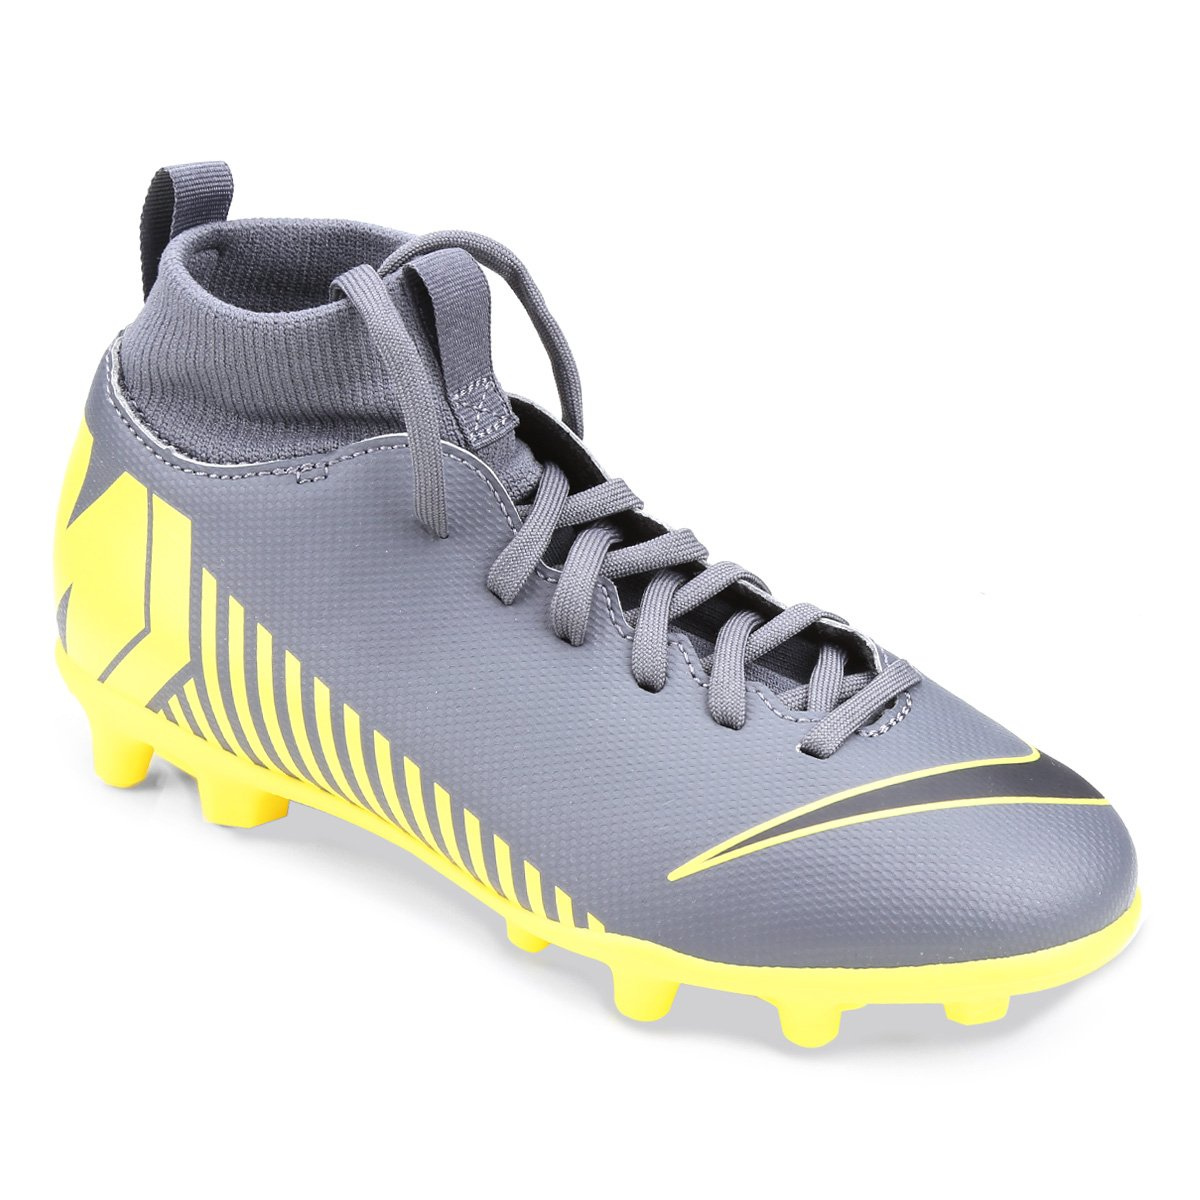 00106d5738515 Chuteira Campo Infantil Nike Mercurial Superfly 6 Club FG